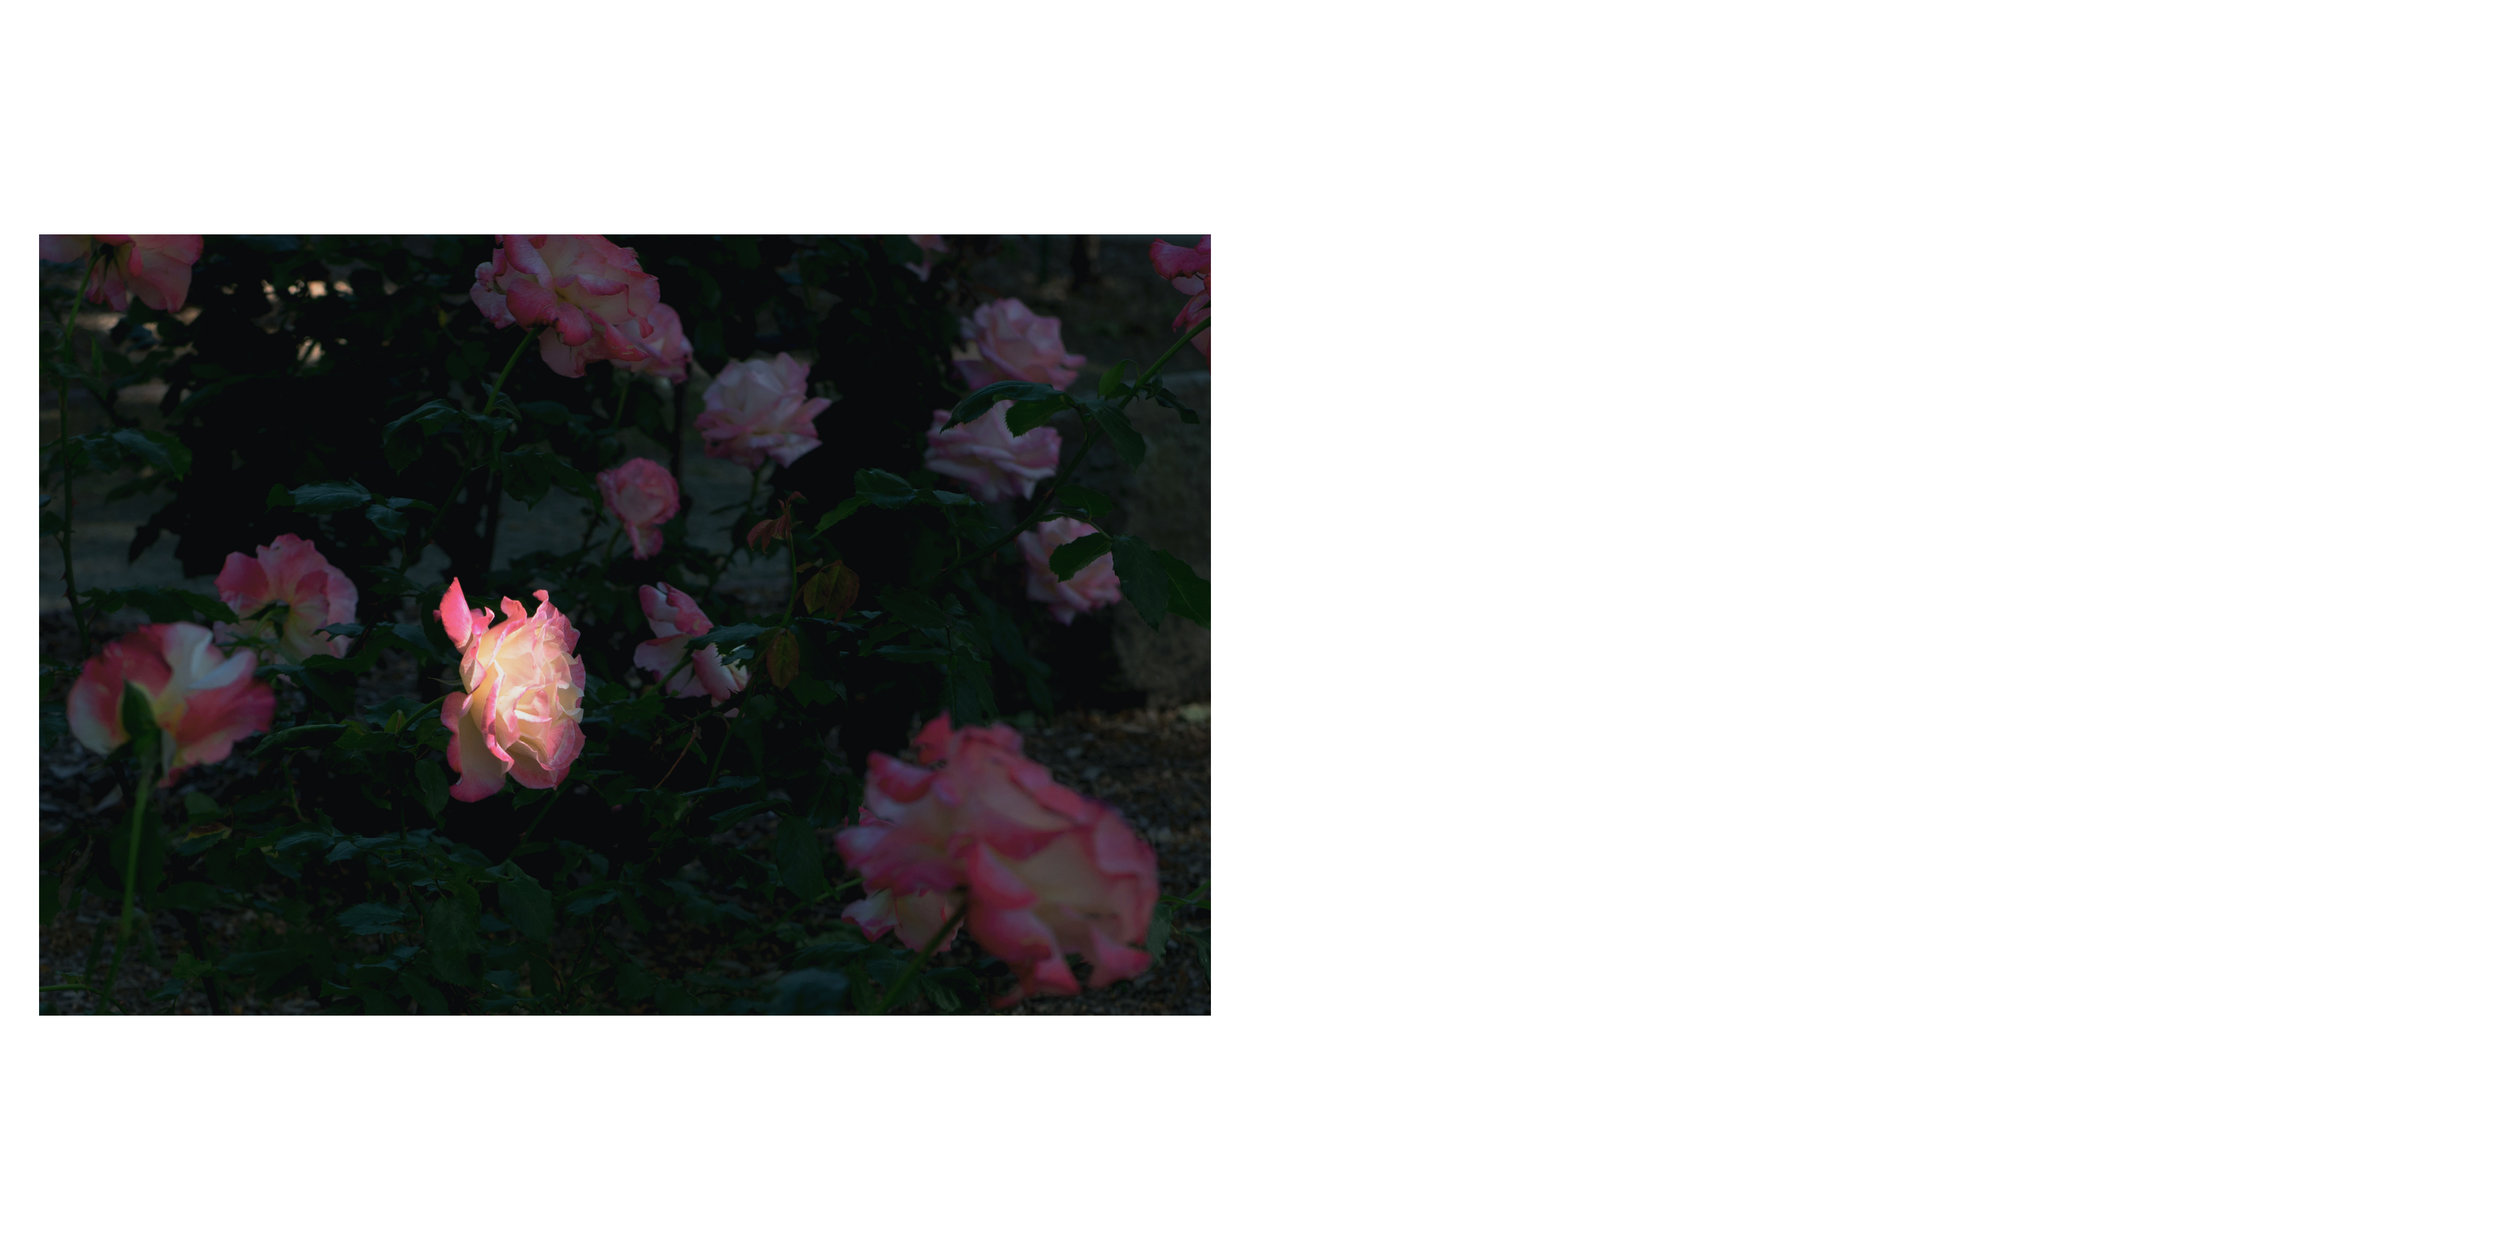 Untitled-611.jpg